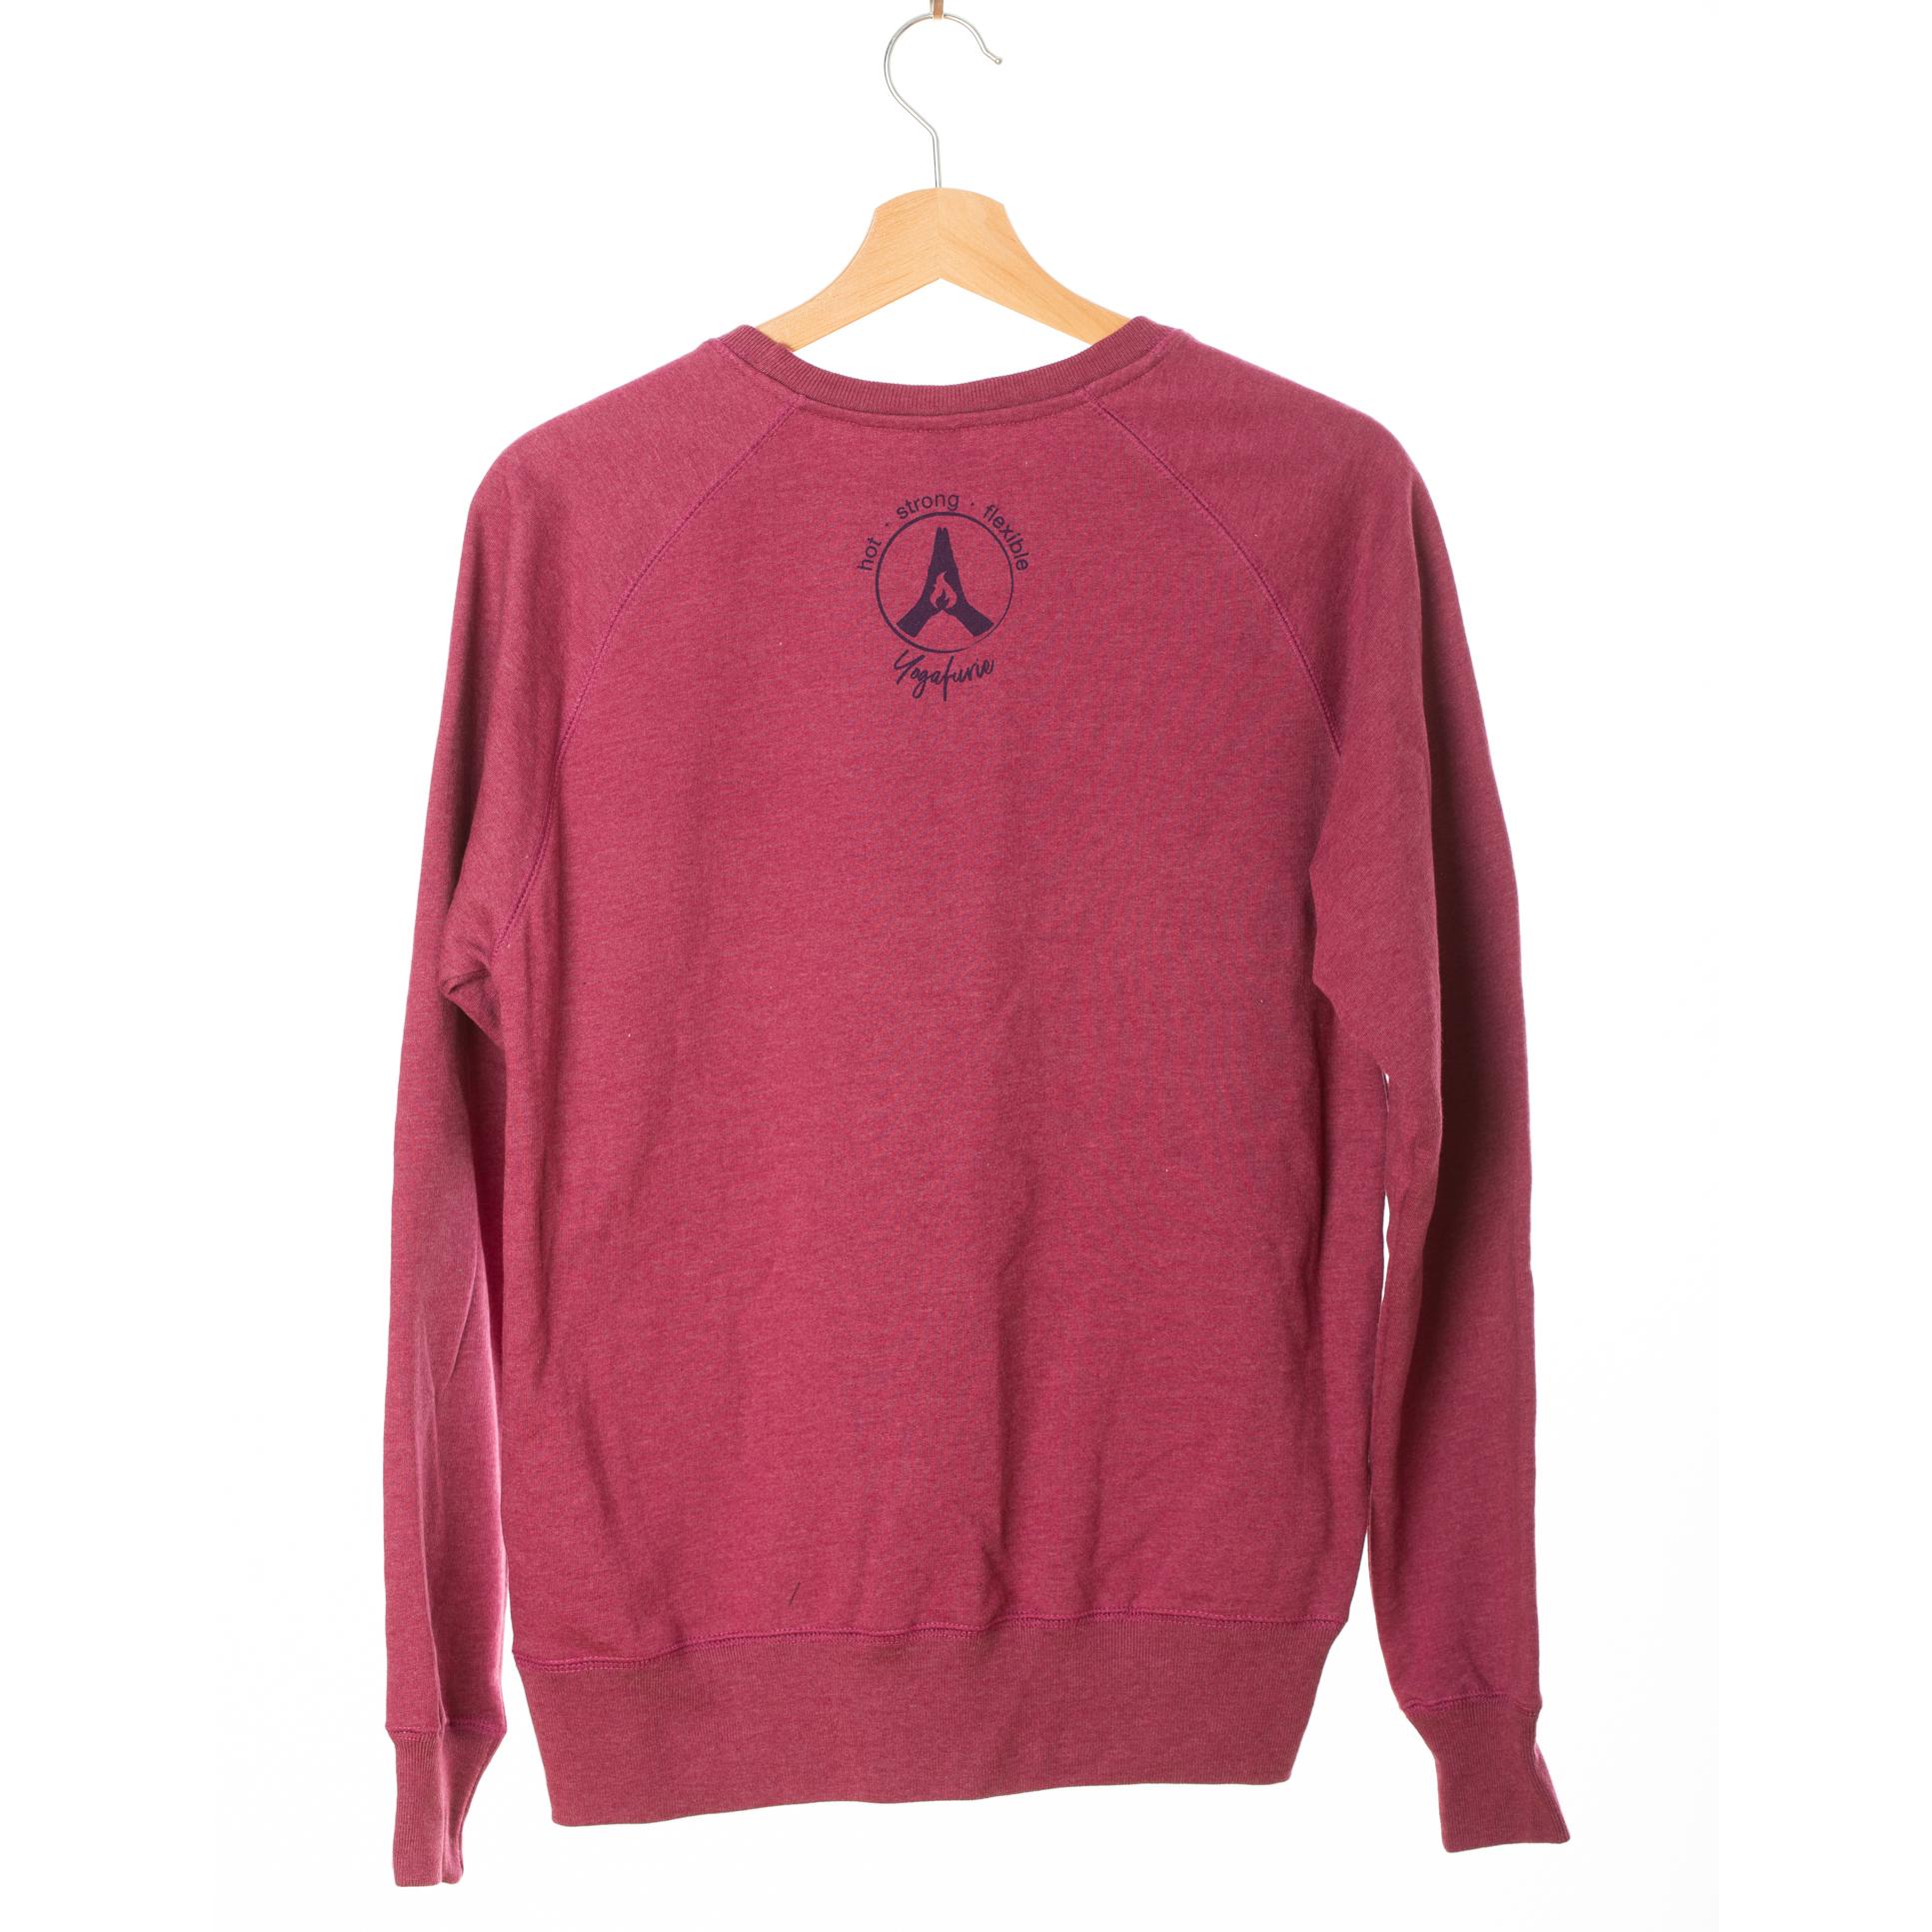 Yogafurie Sweatshirt